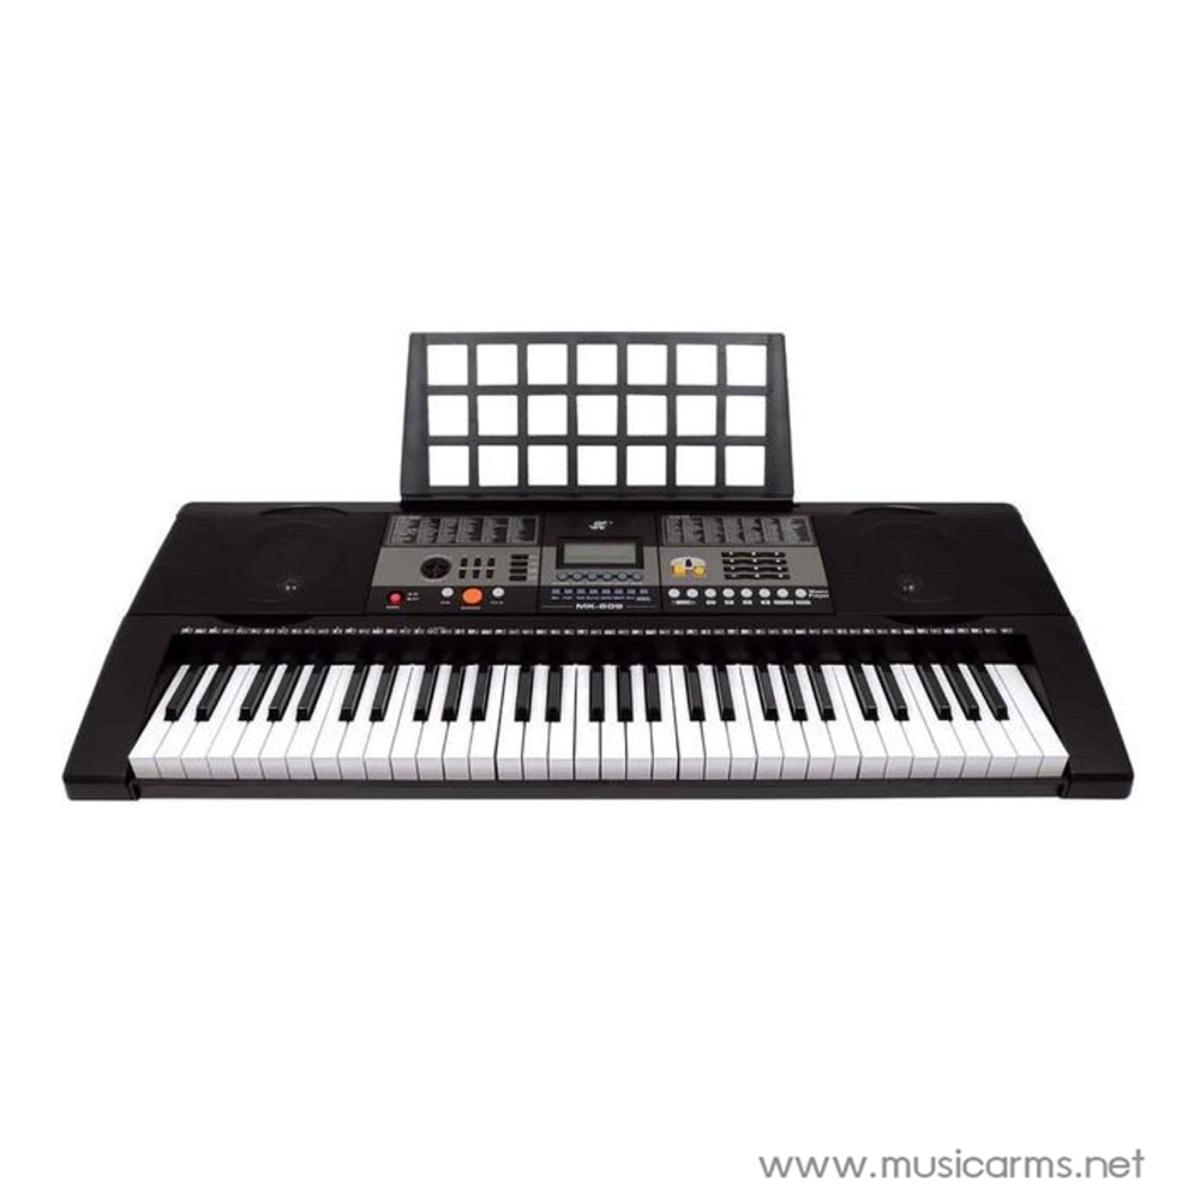 MK-809 61 Keys